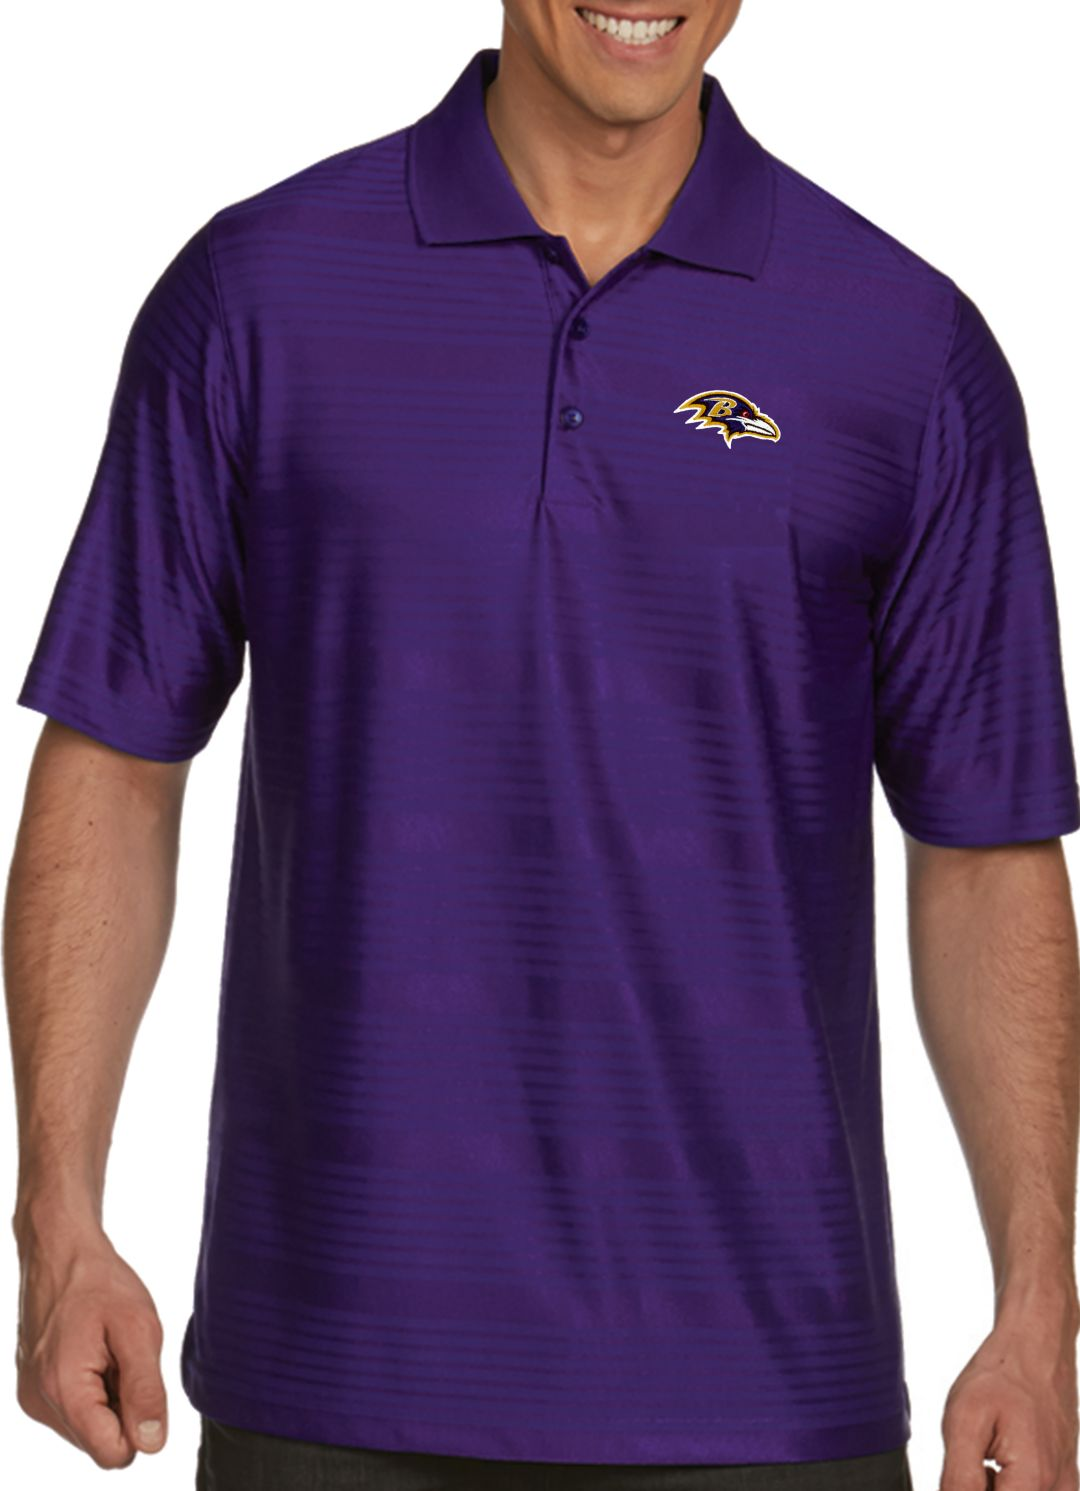 a95121d6 Antigua Men's Baltimore Ravens Illusion Purple Xtra-Lite Polo